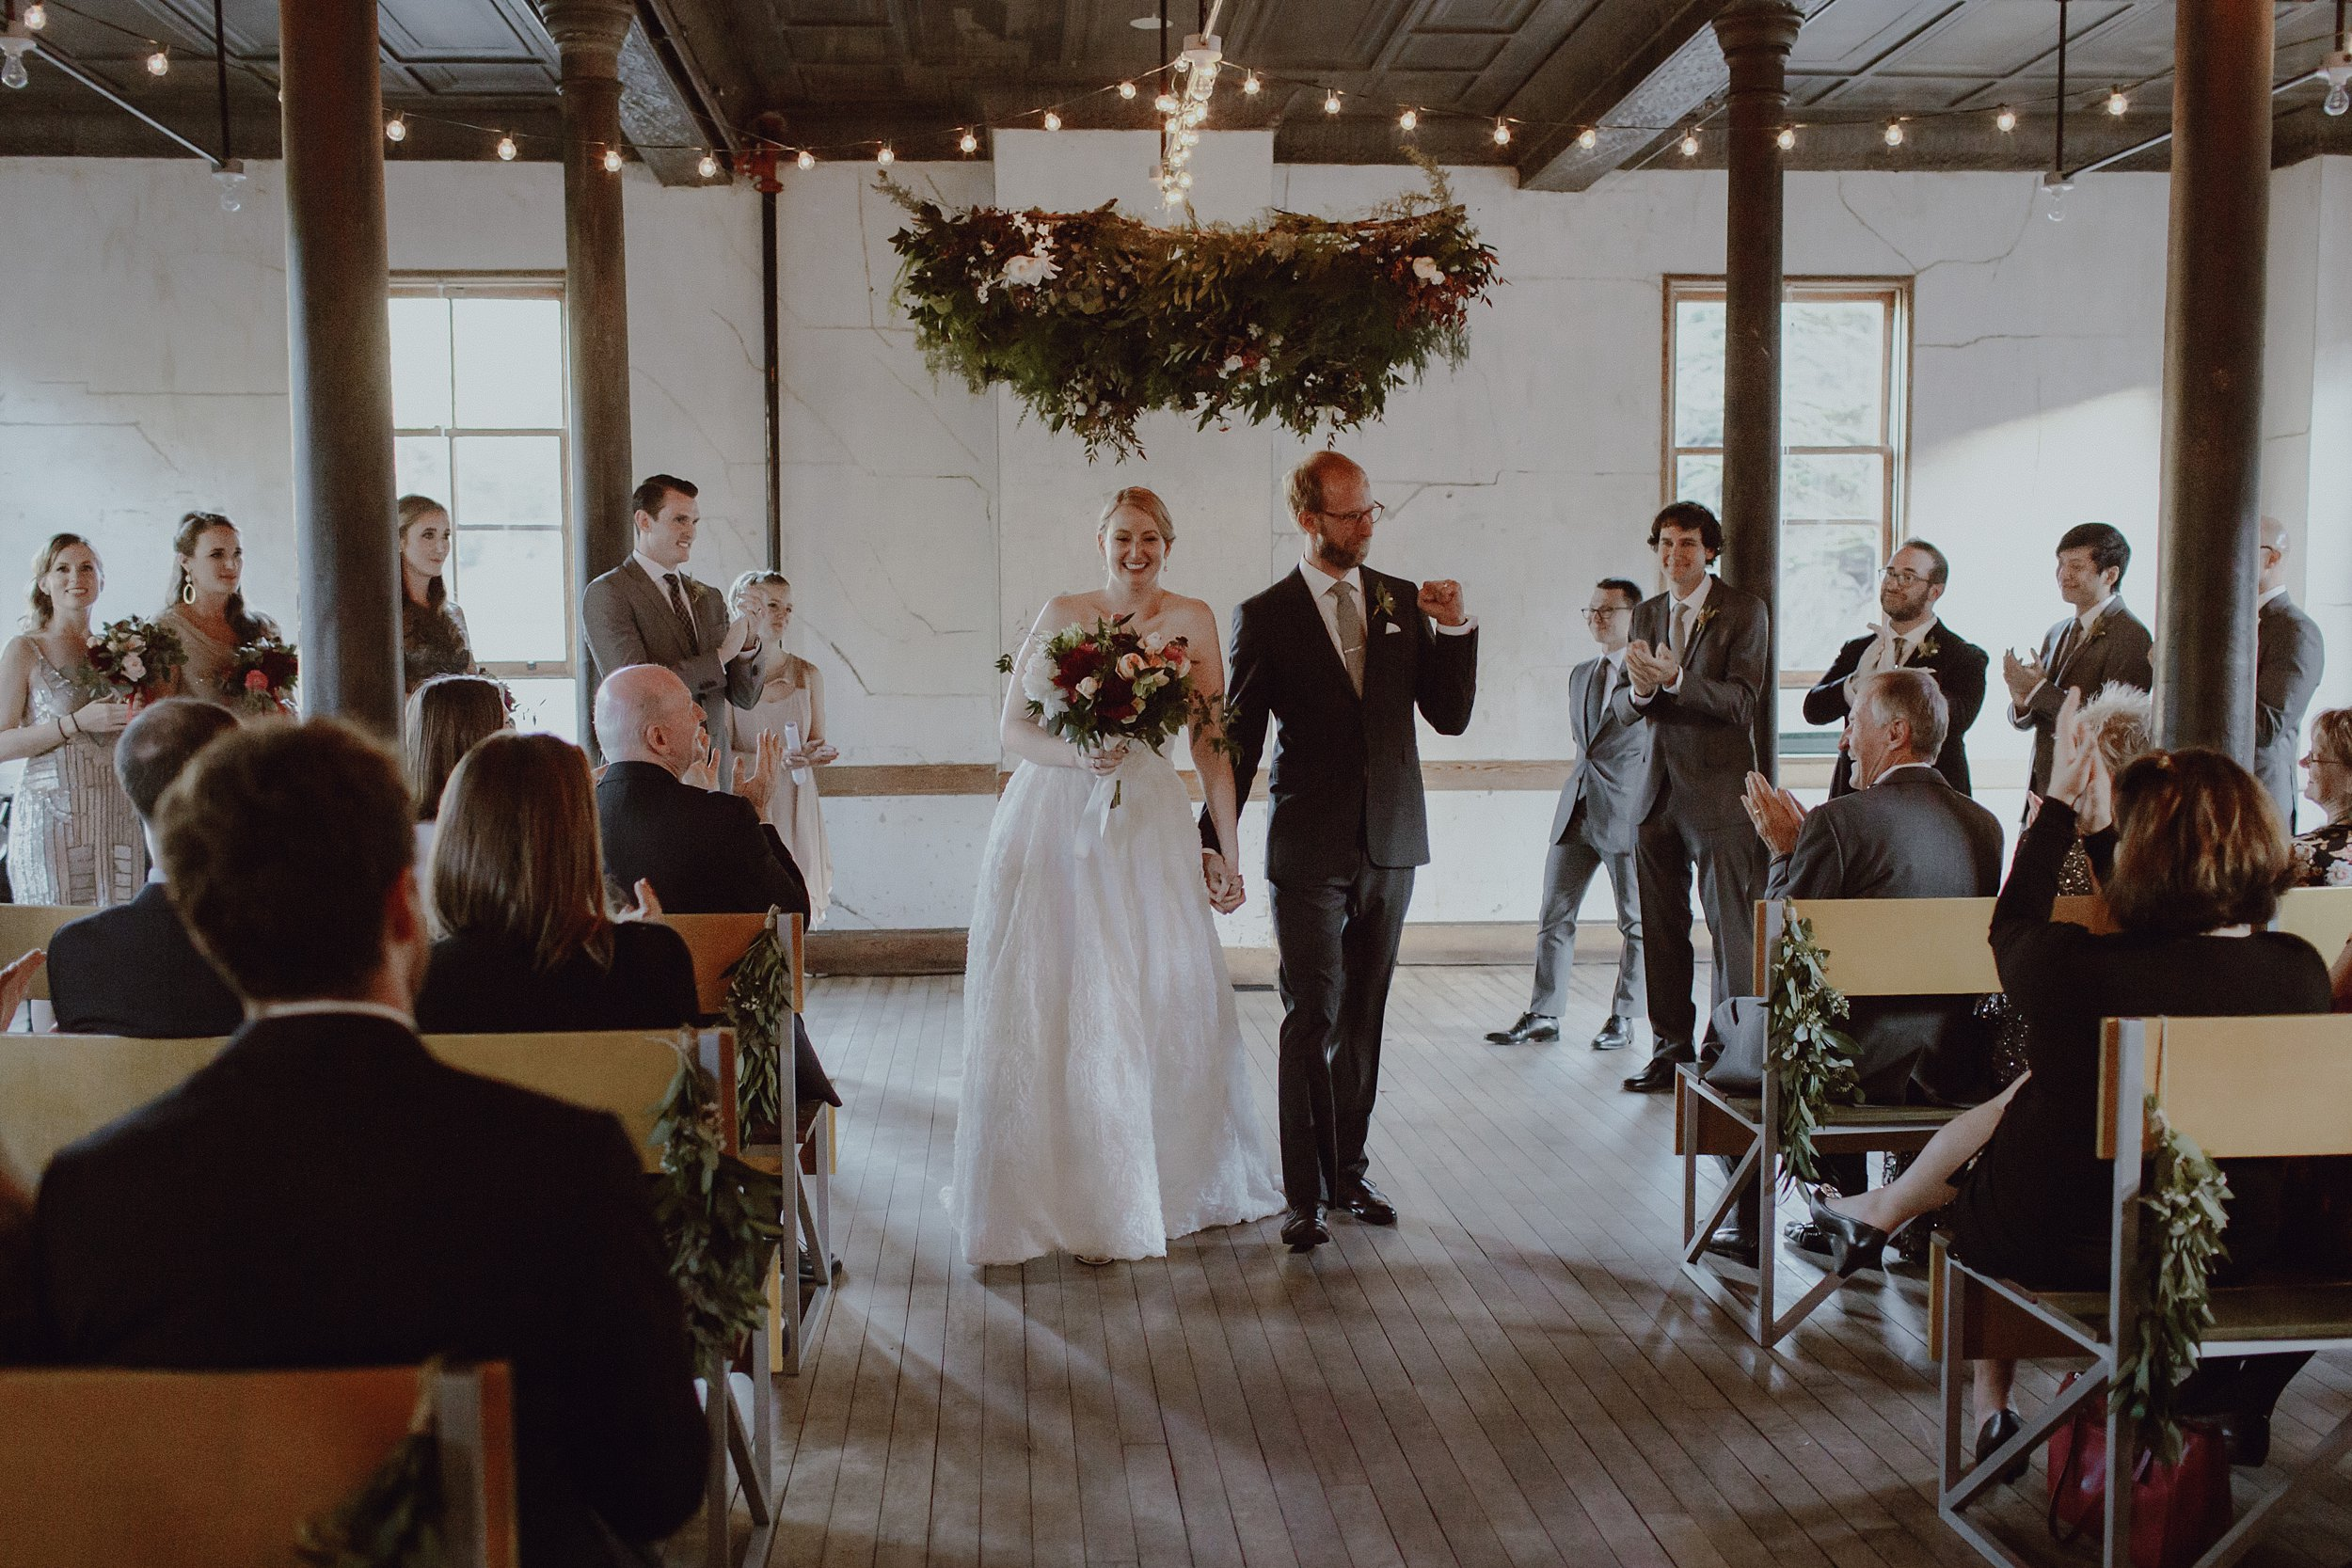 headlands-center-for-the-arts-wedding_0040.jpg